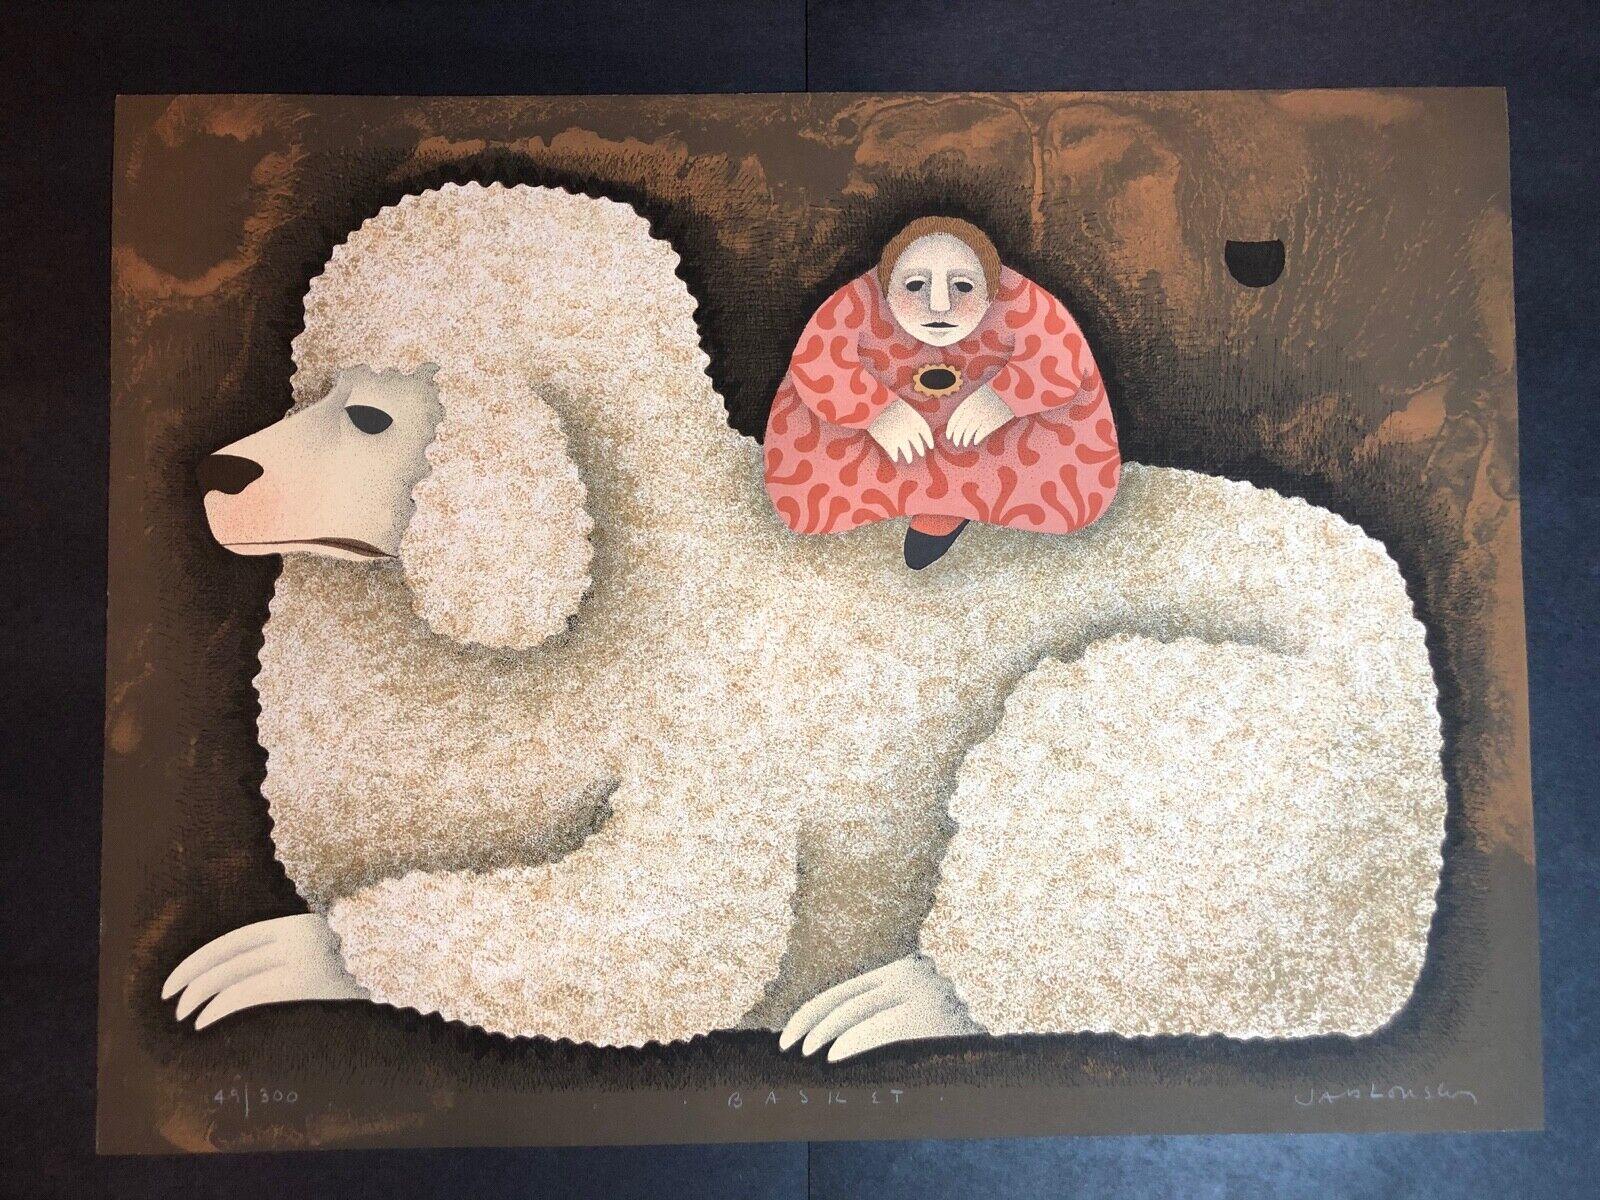 Carol Jablonsky Lithograph Art Print – Basilet Limited Edition 49/300 Art